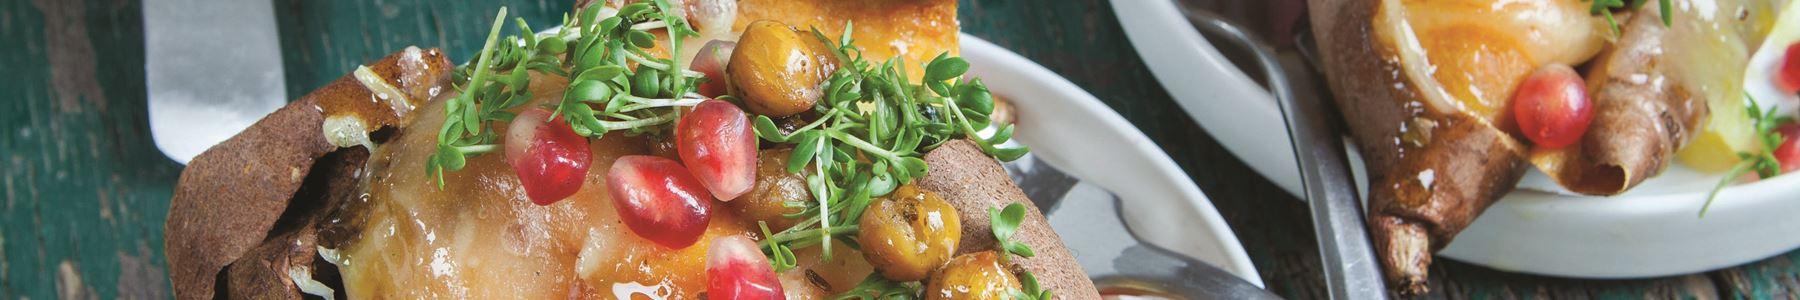 Granatæble + Kartofler